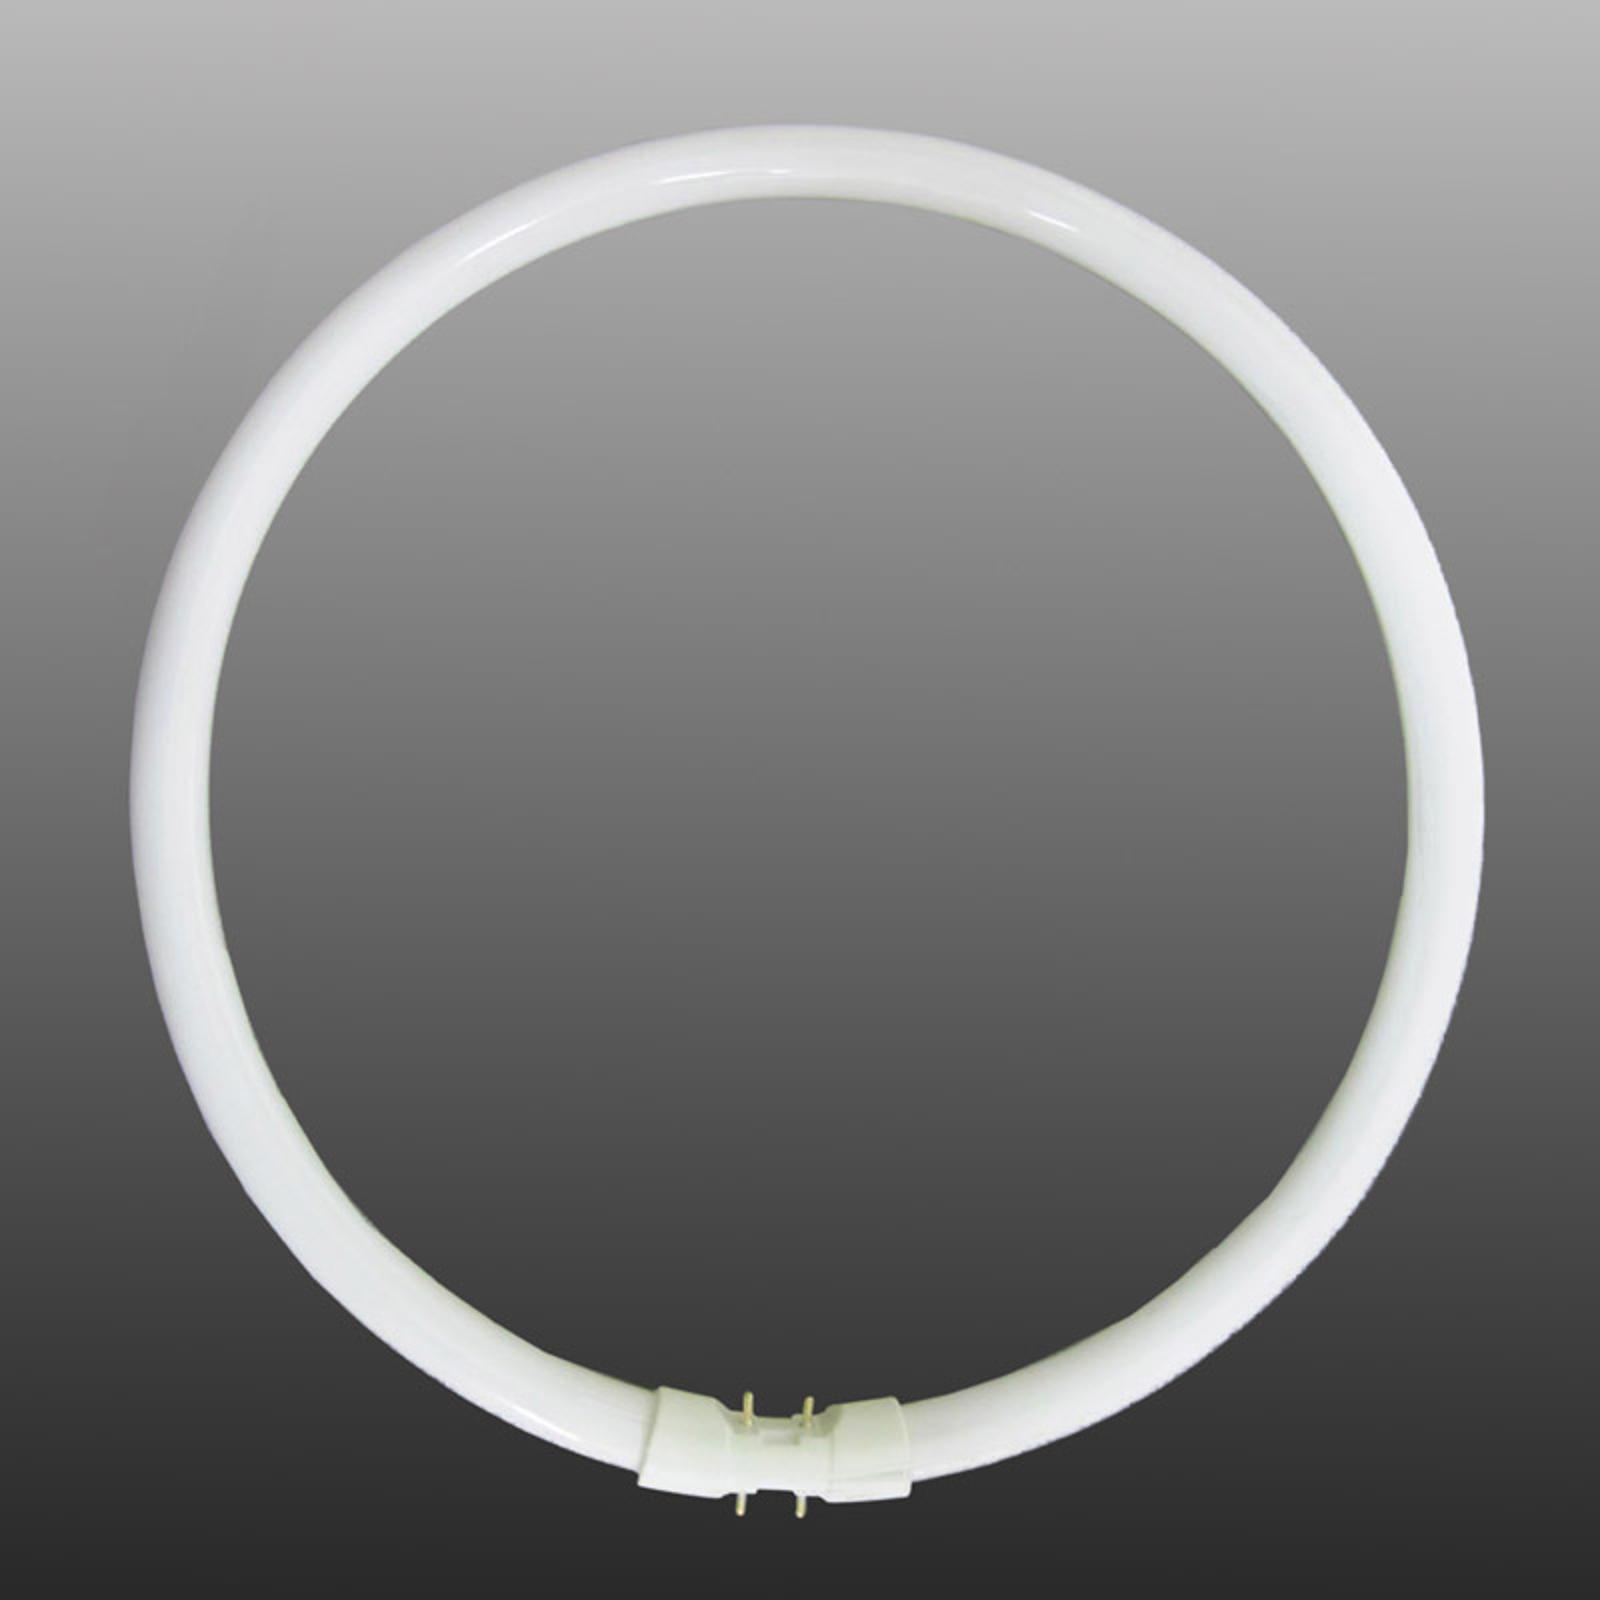 2GX13 T5 55W ringformet lysstoffrør, varmhvit